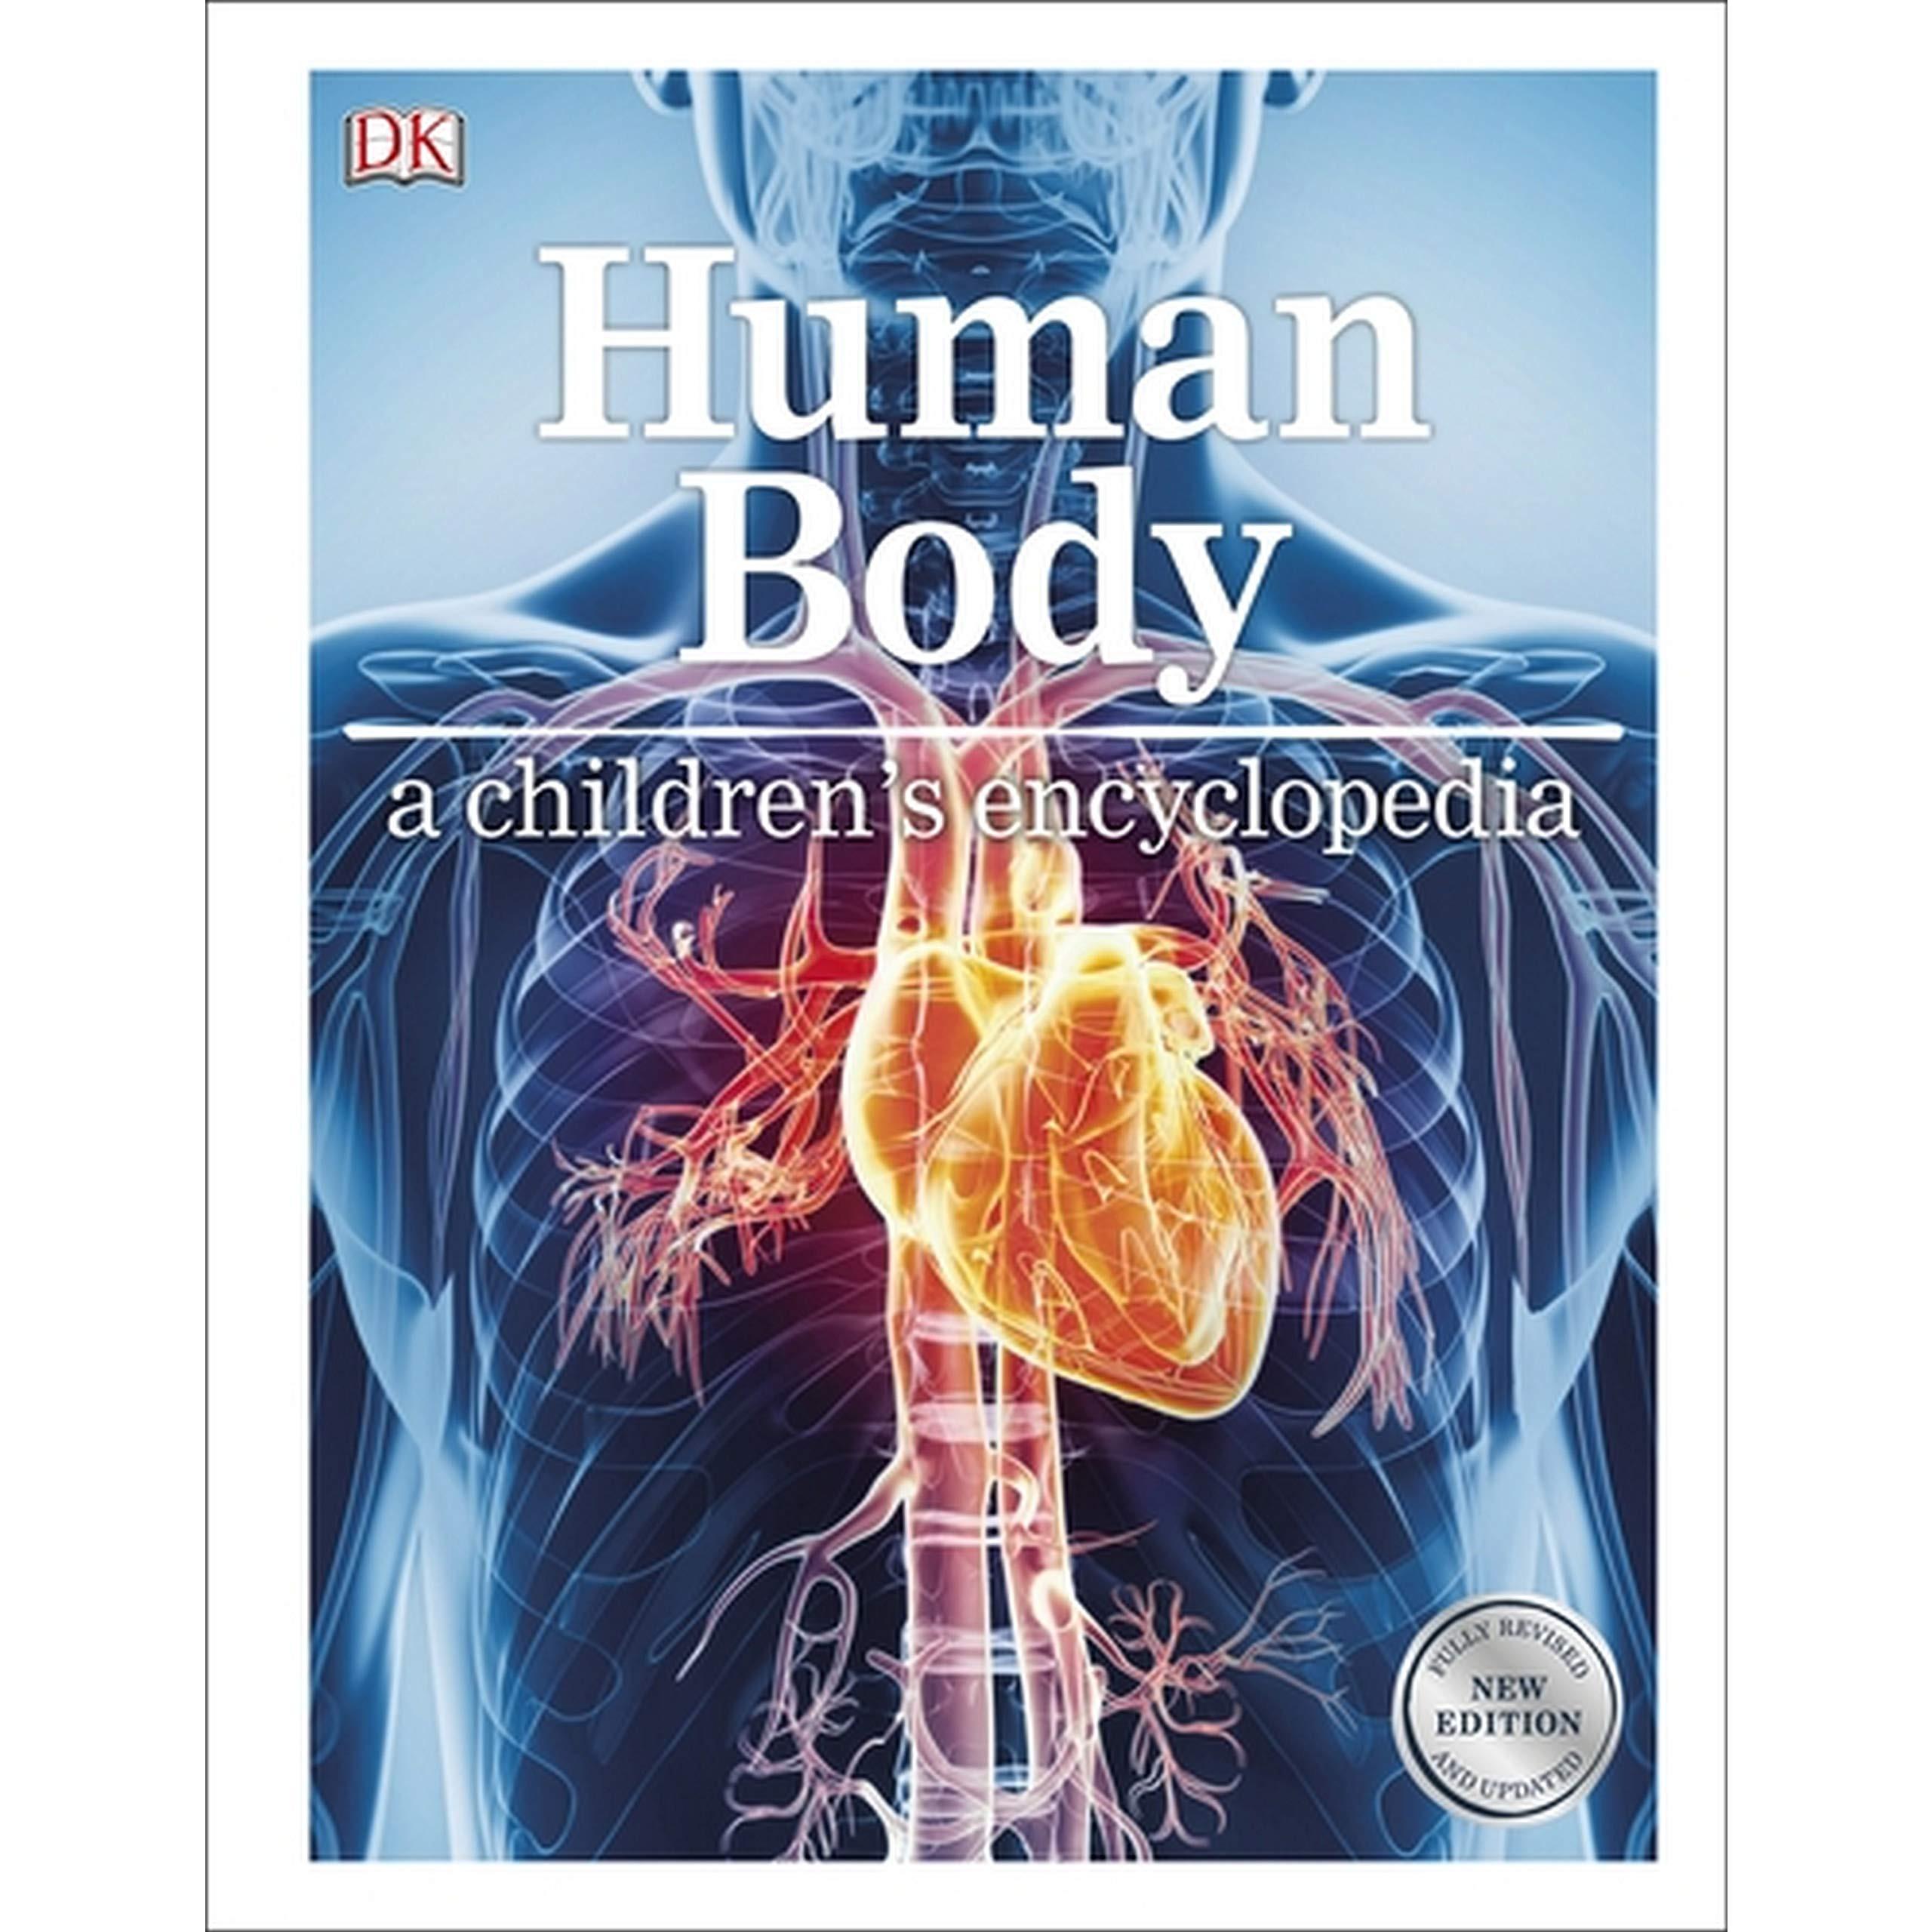 Human Body A Children's Encyclopedia